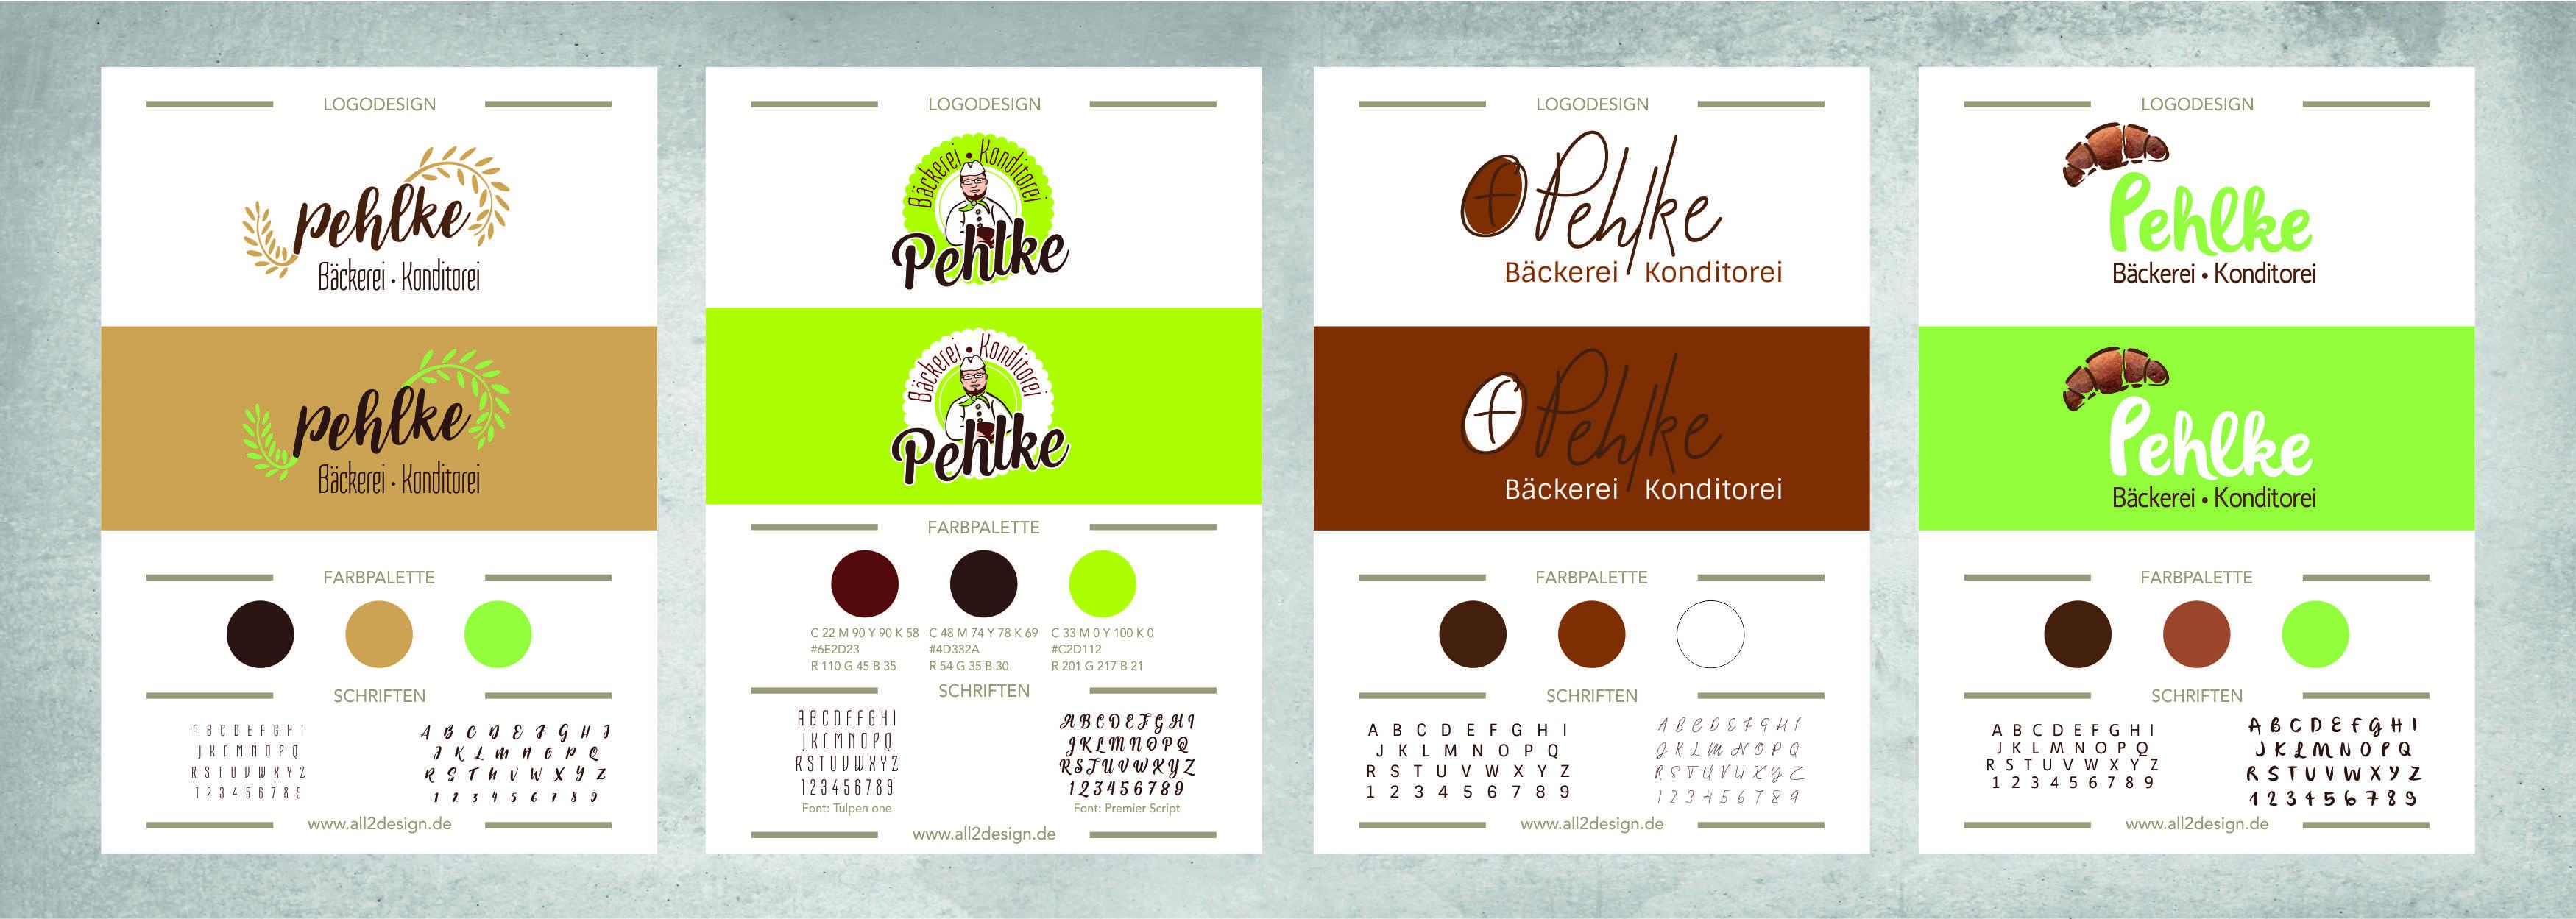 Portfolio Pehlke Logodesign Corporate Design Logoentwürfe all2design Laura Friedrich